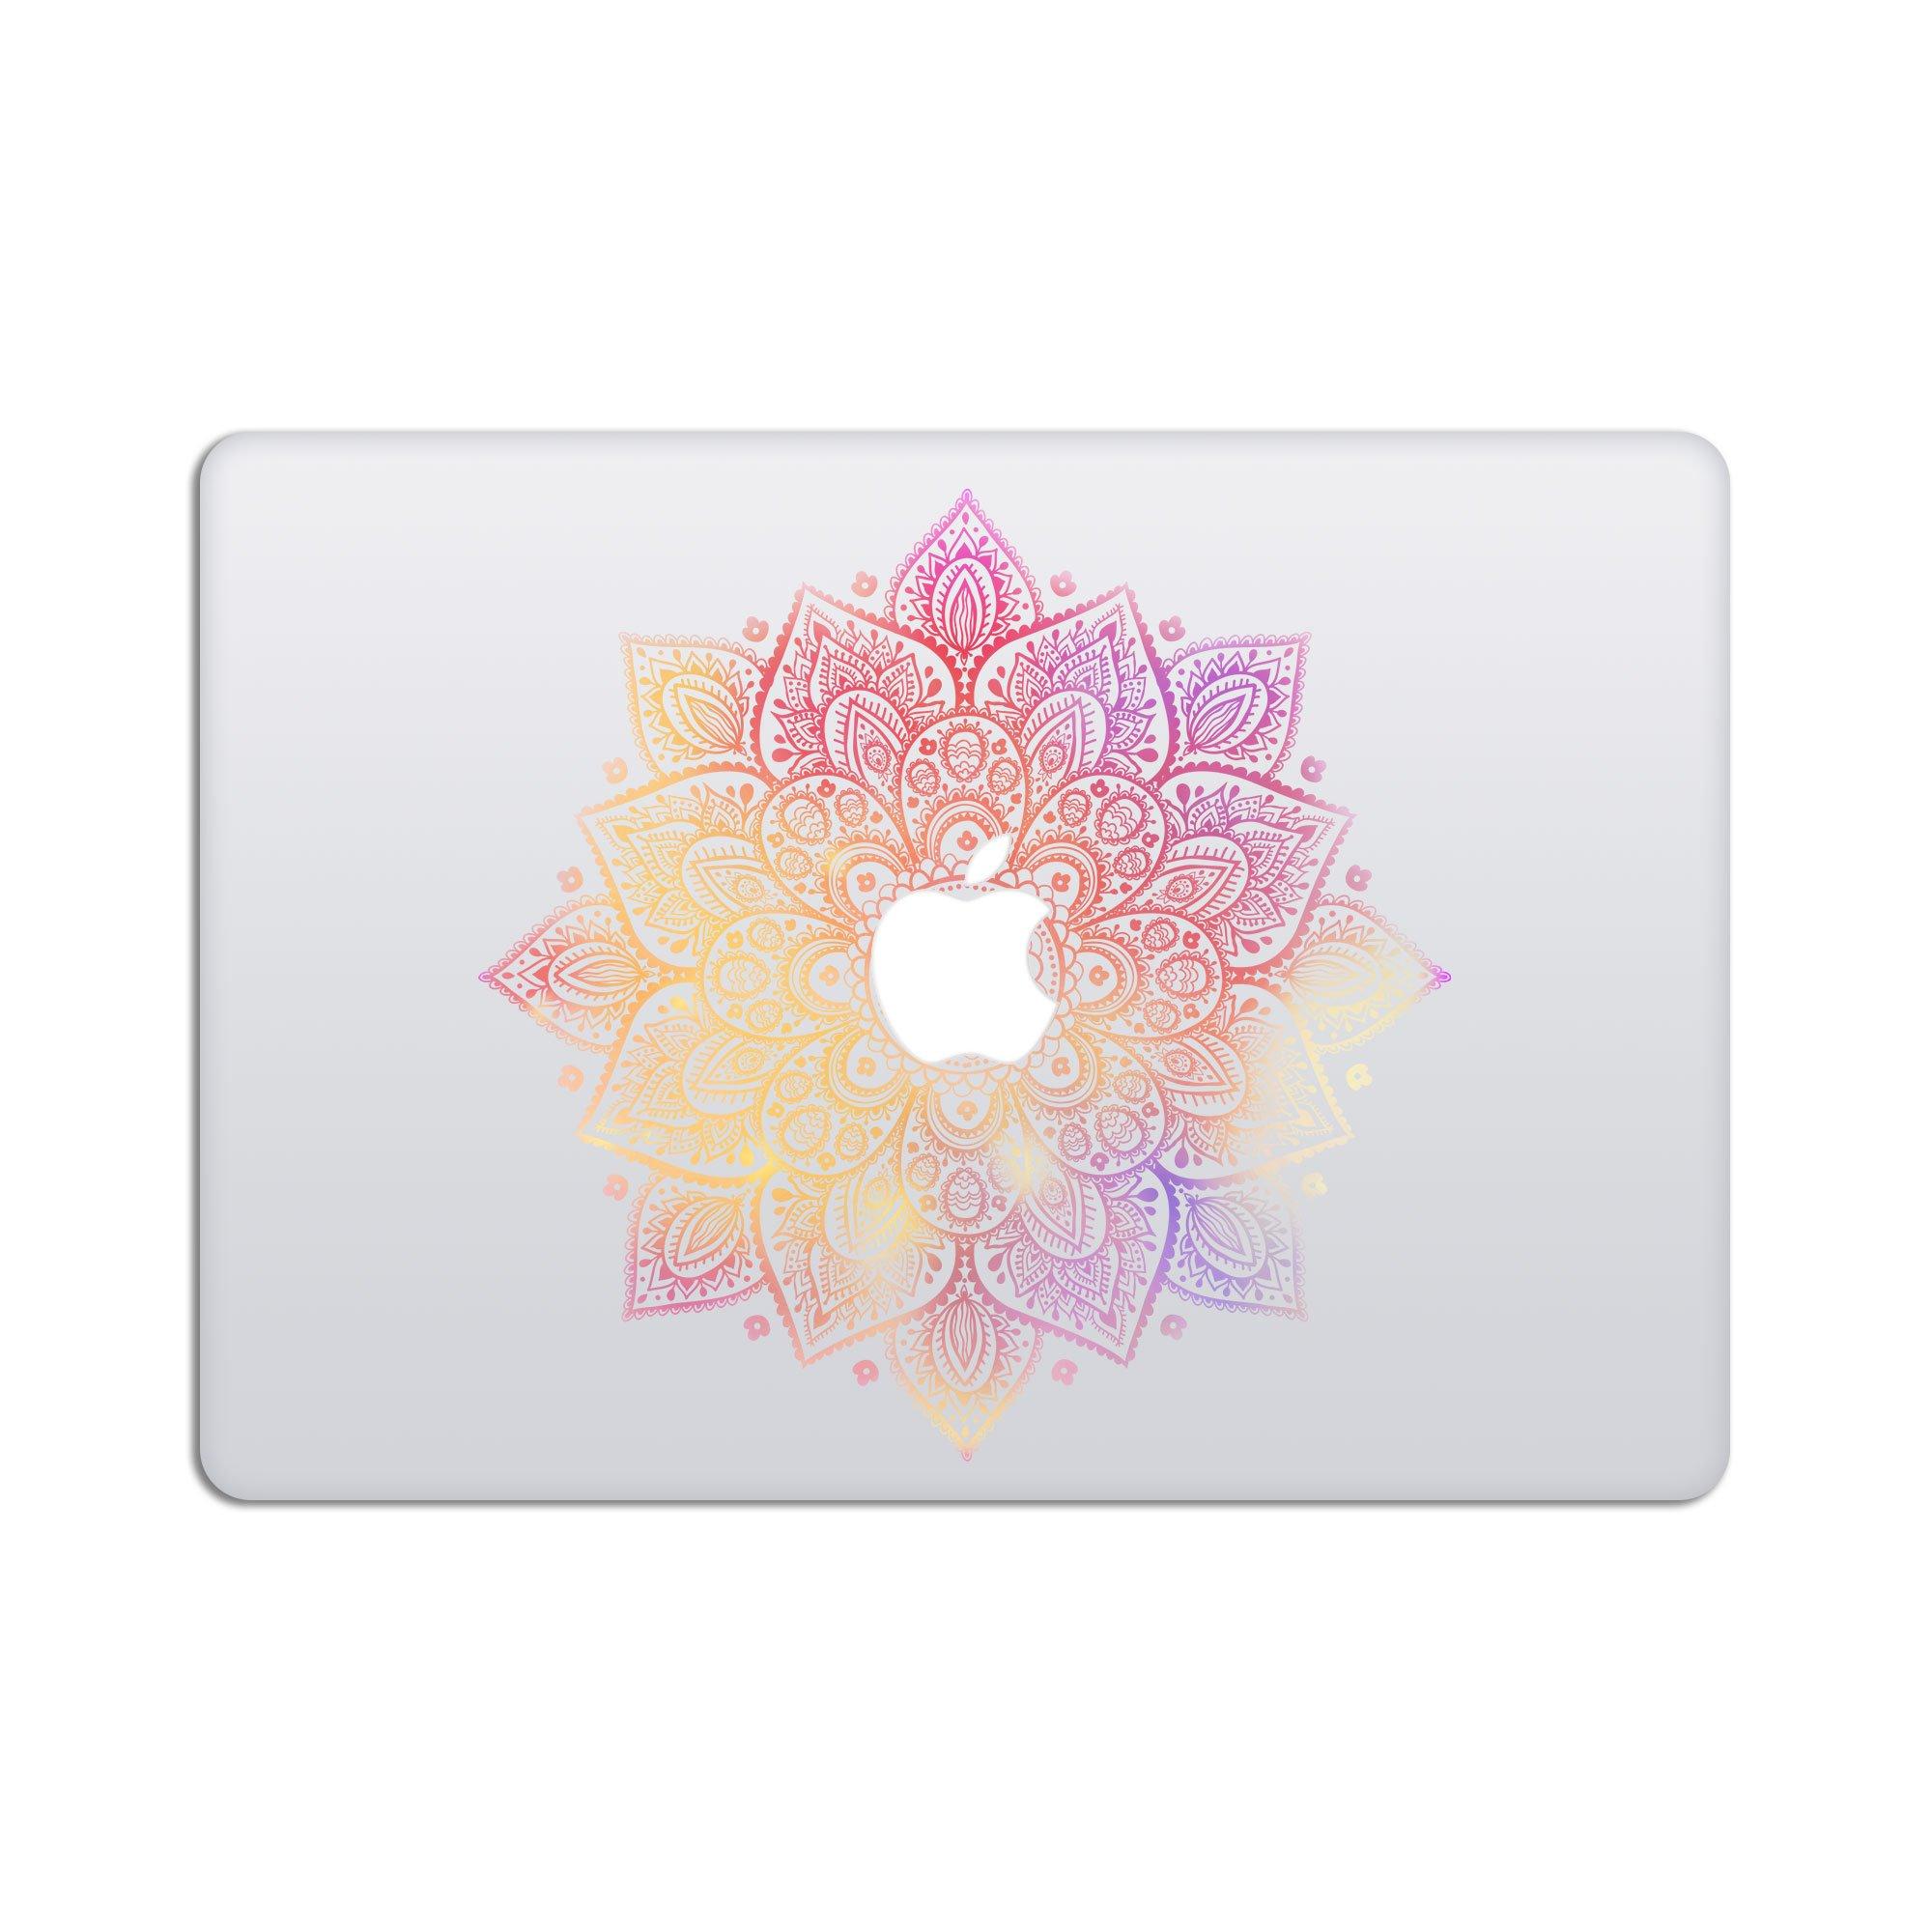 Laptop Stickers MacBook Decal - Removable Vinyl w/Glowing Apple Logo Diecut - Mandala Decal Milky Way Colorful Skin for MacBook Air Pro 13 15 inch Mac Retina - Best Decorative Sticker by Artsybb